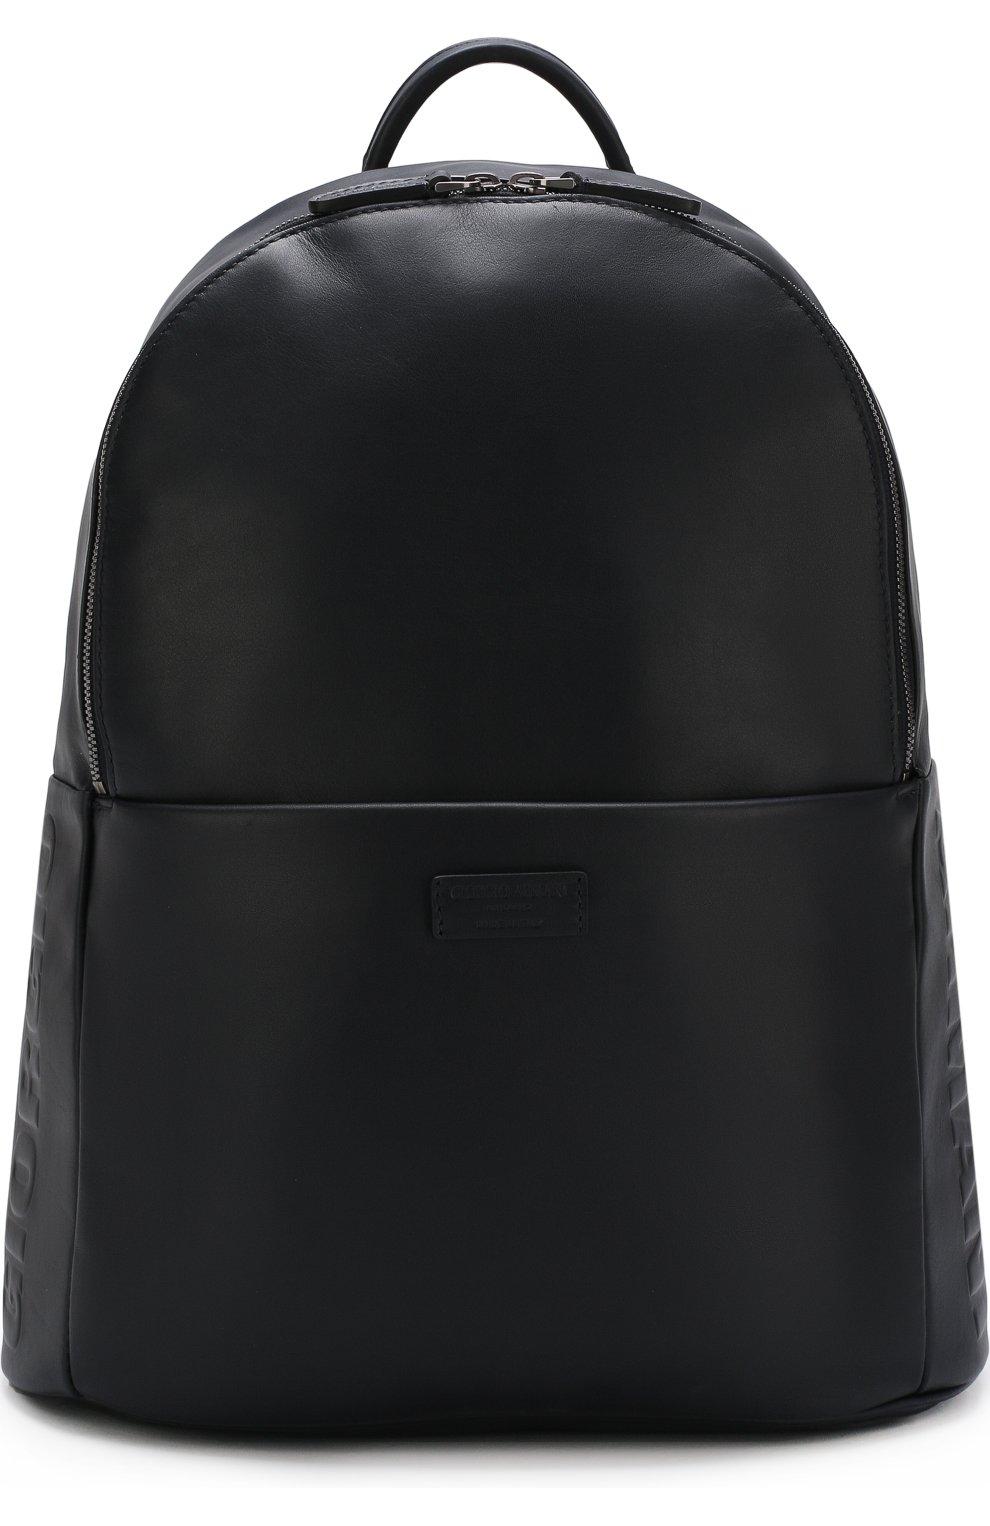 9eb8b7203ff4 Фото Мужской темно-синий однотонный кожаный рюкзак GIORGIO ARMANI Италия  5231192 Y20091/YDN1J